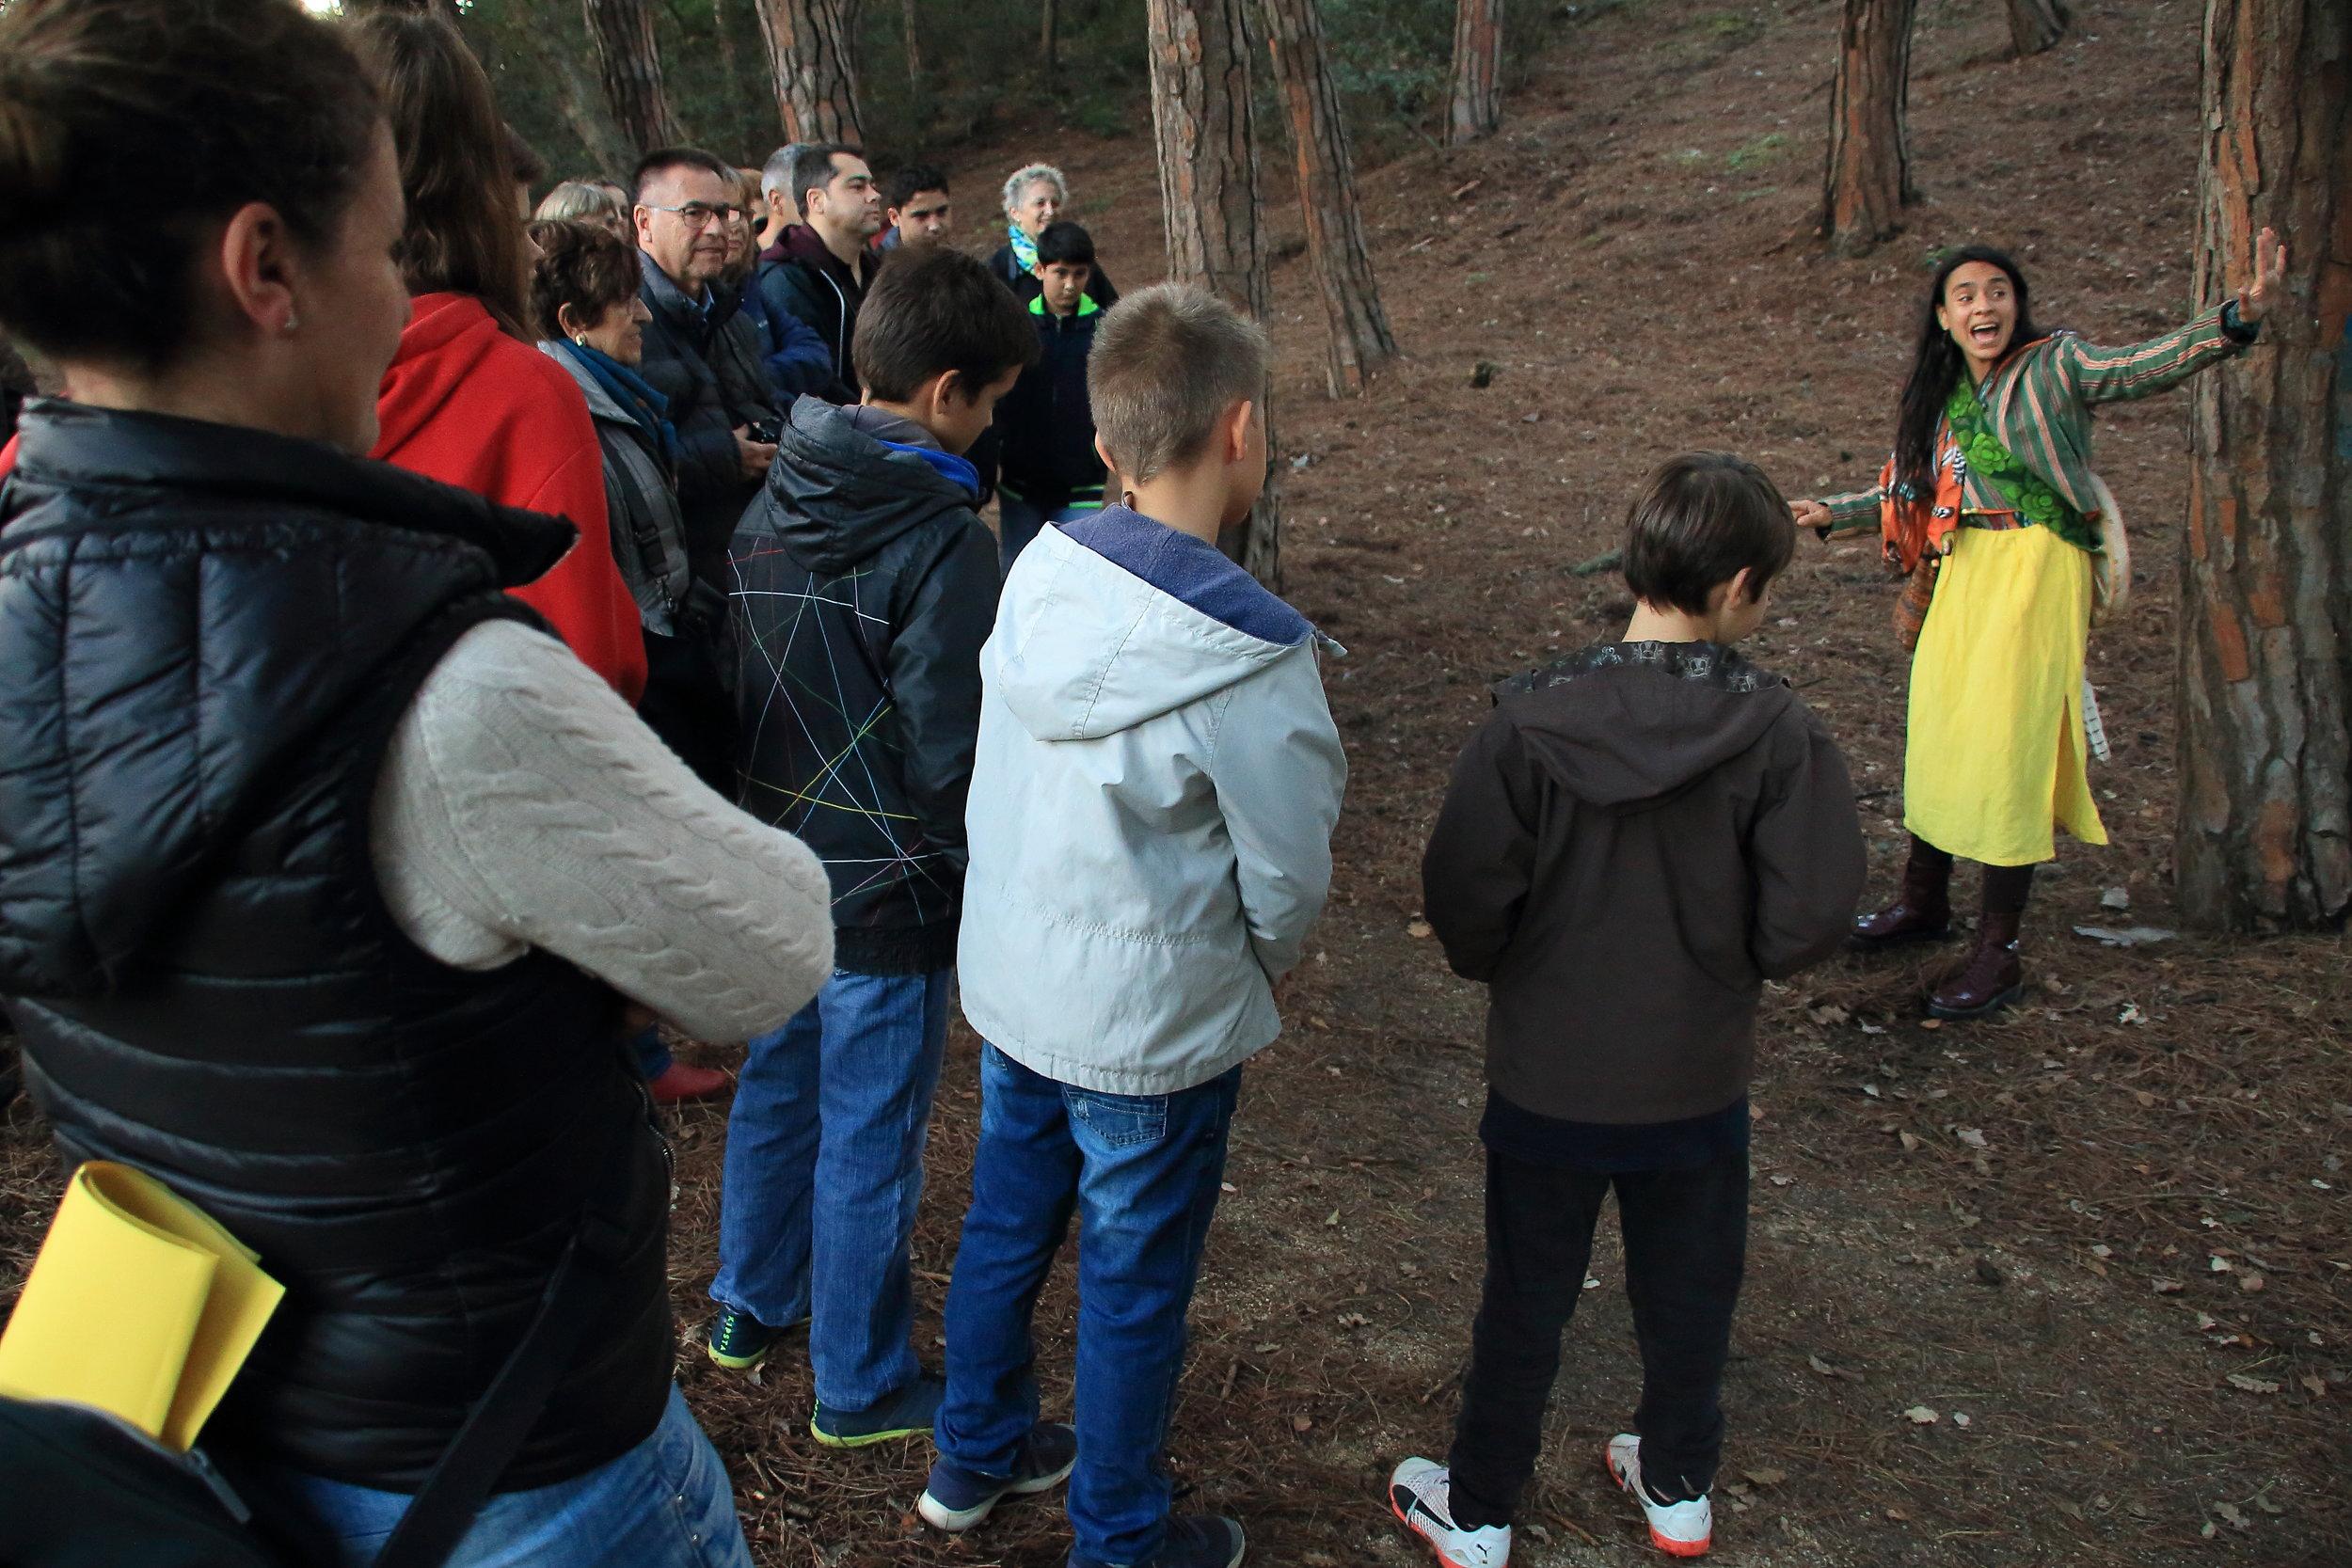 ohtli en Arrela't 2018 (Malgrat de Mar, Catalunya) - Foto de Sebastián Troncoso 13.JPG